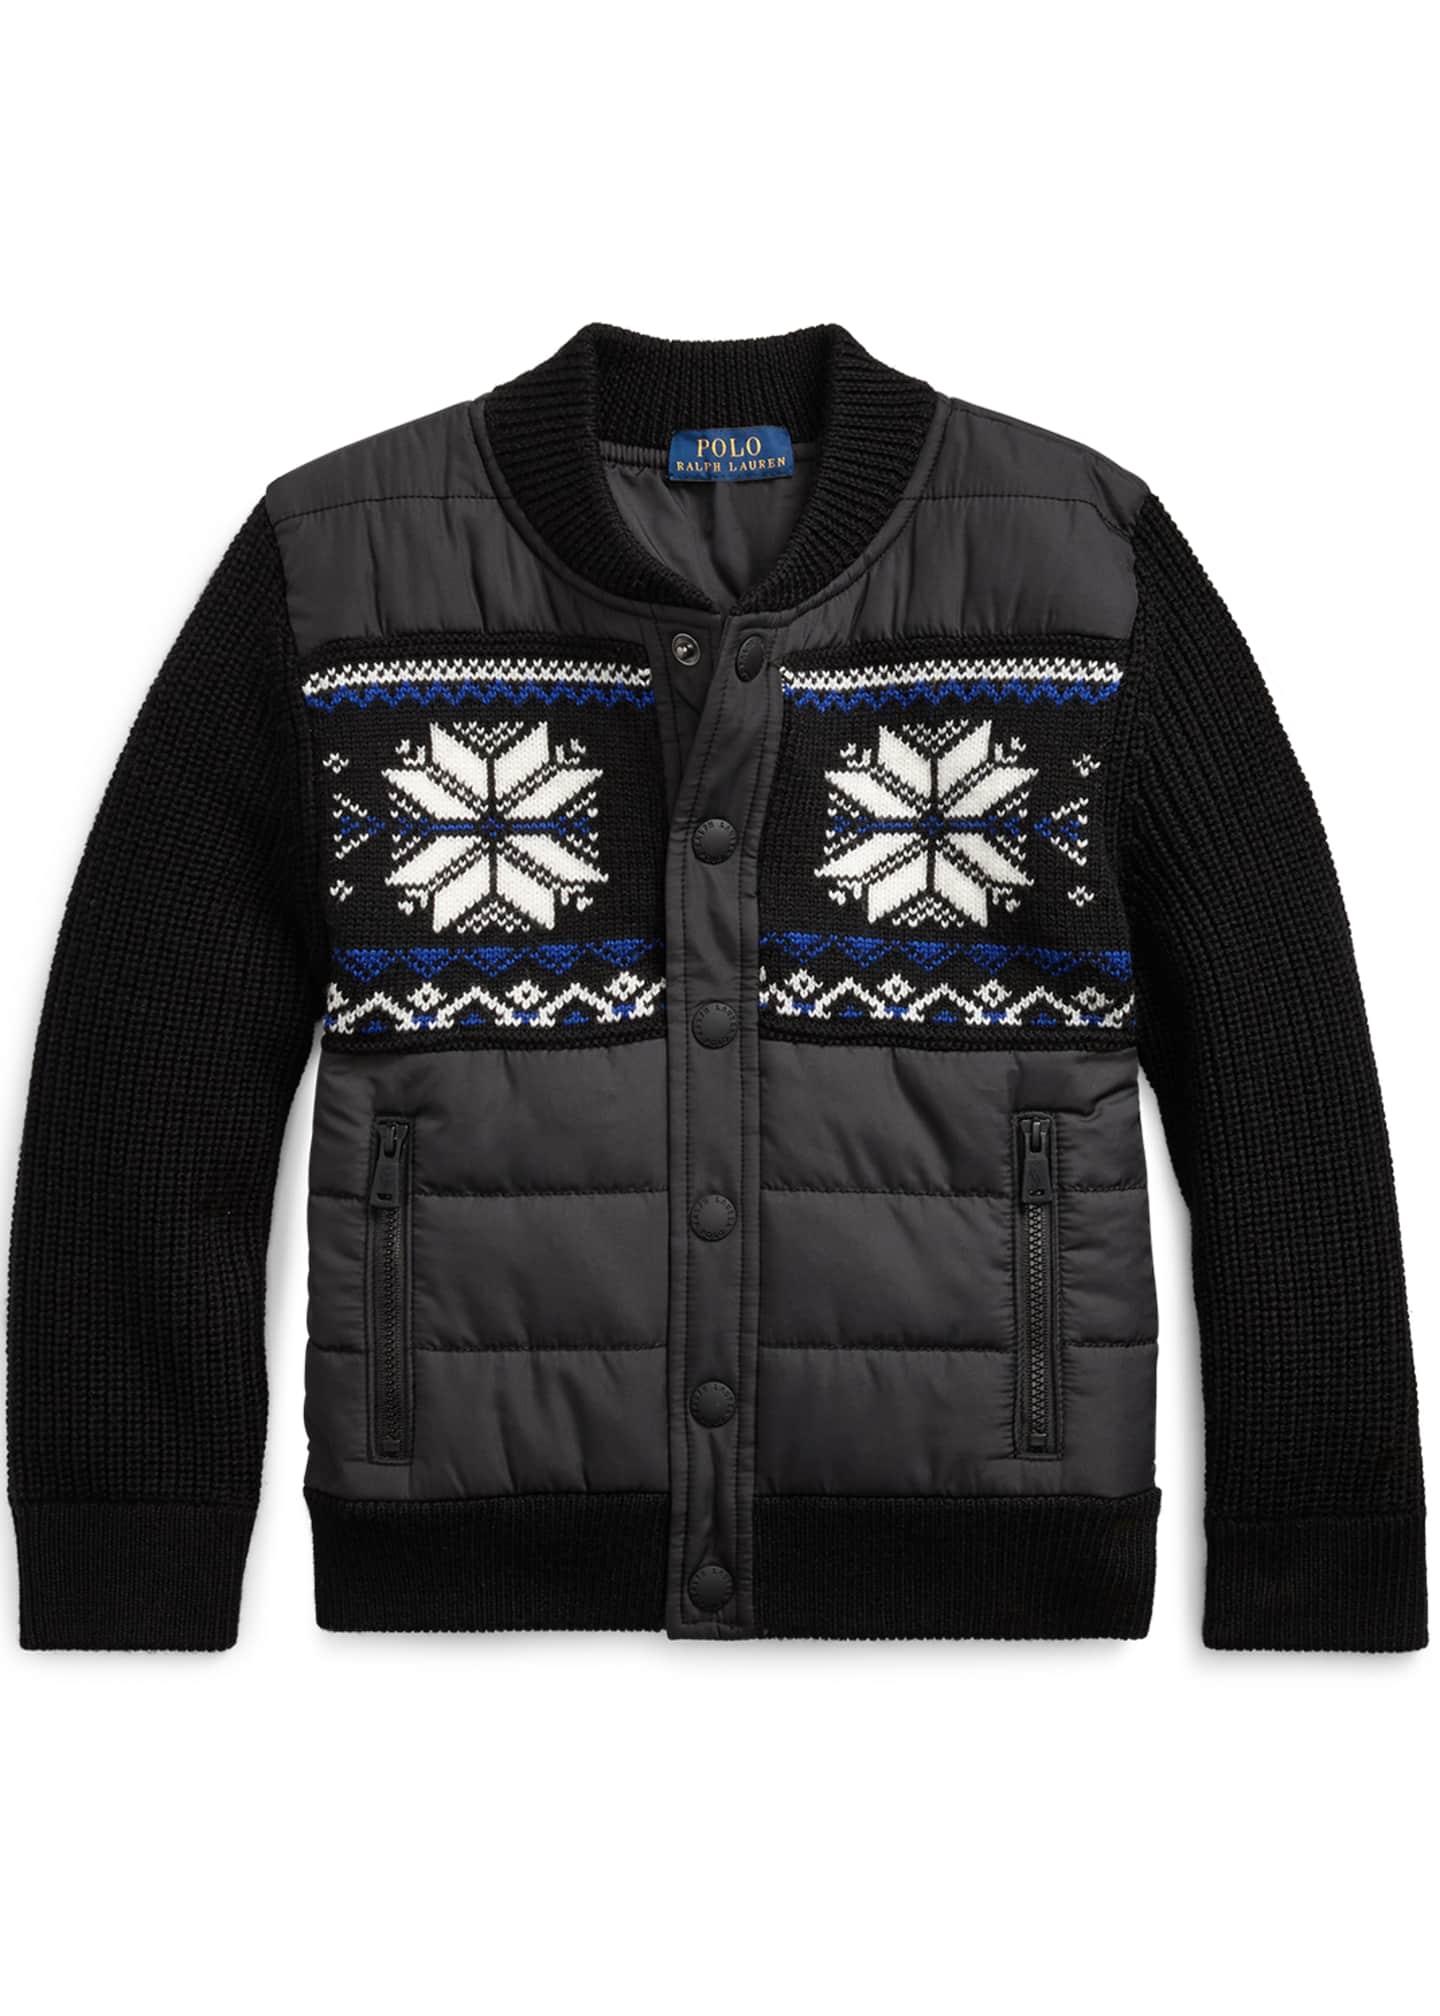 Ralph Lauren Childrenswear Boy's Merino Wool Hybrid Sweater